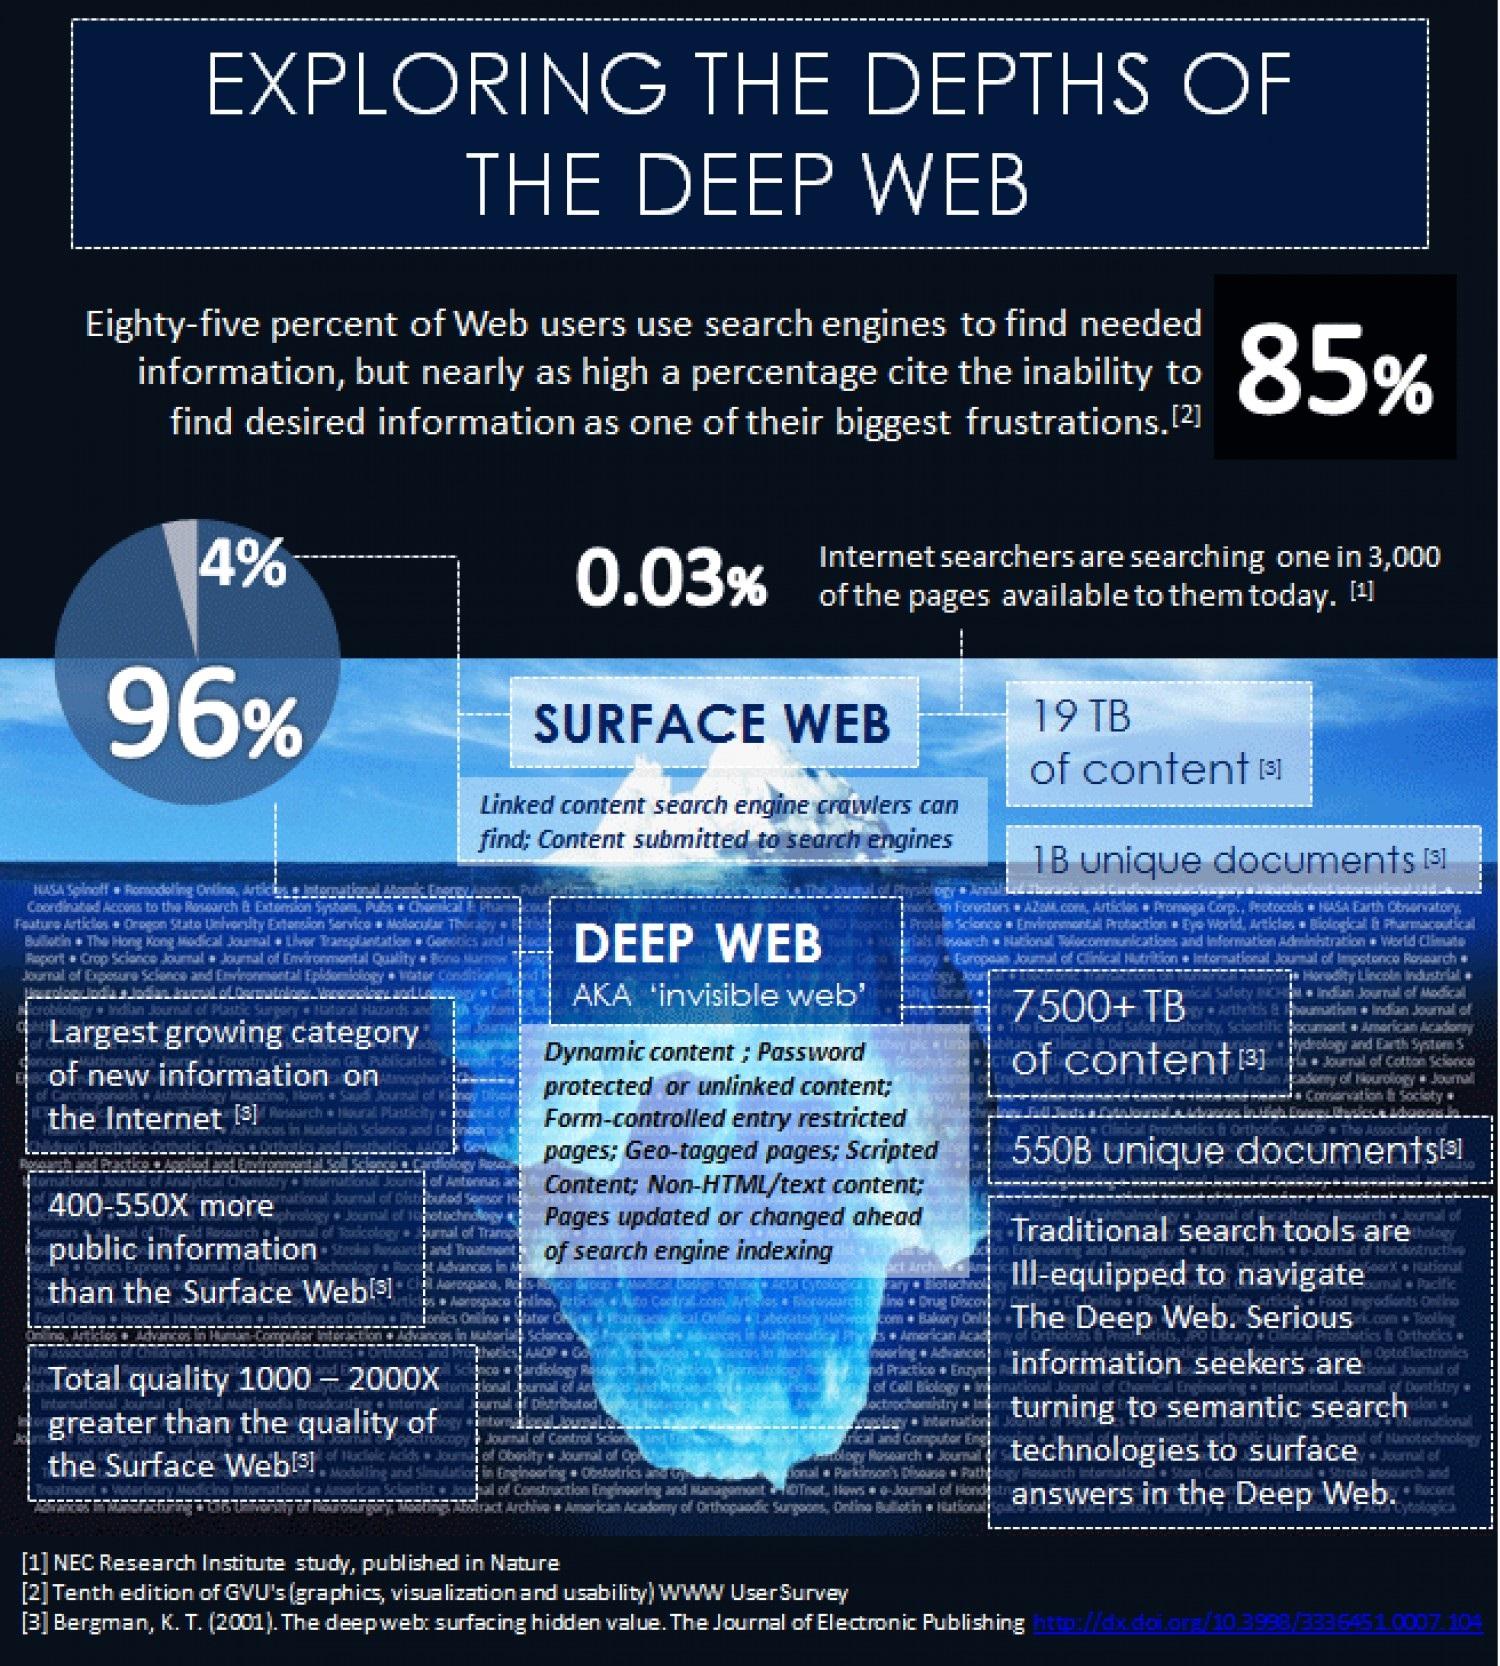 Deep web site - Portfolio protection